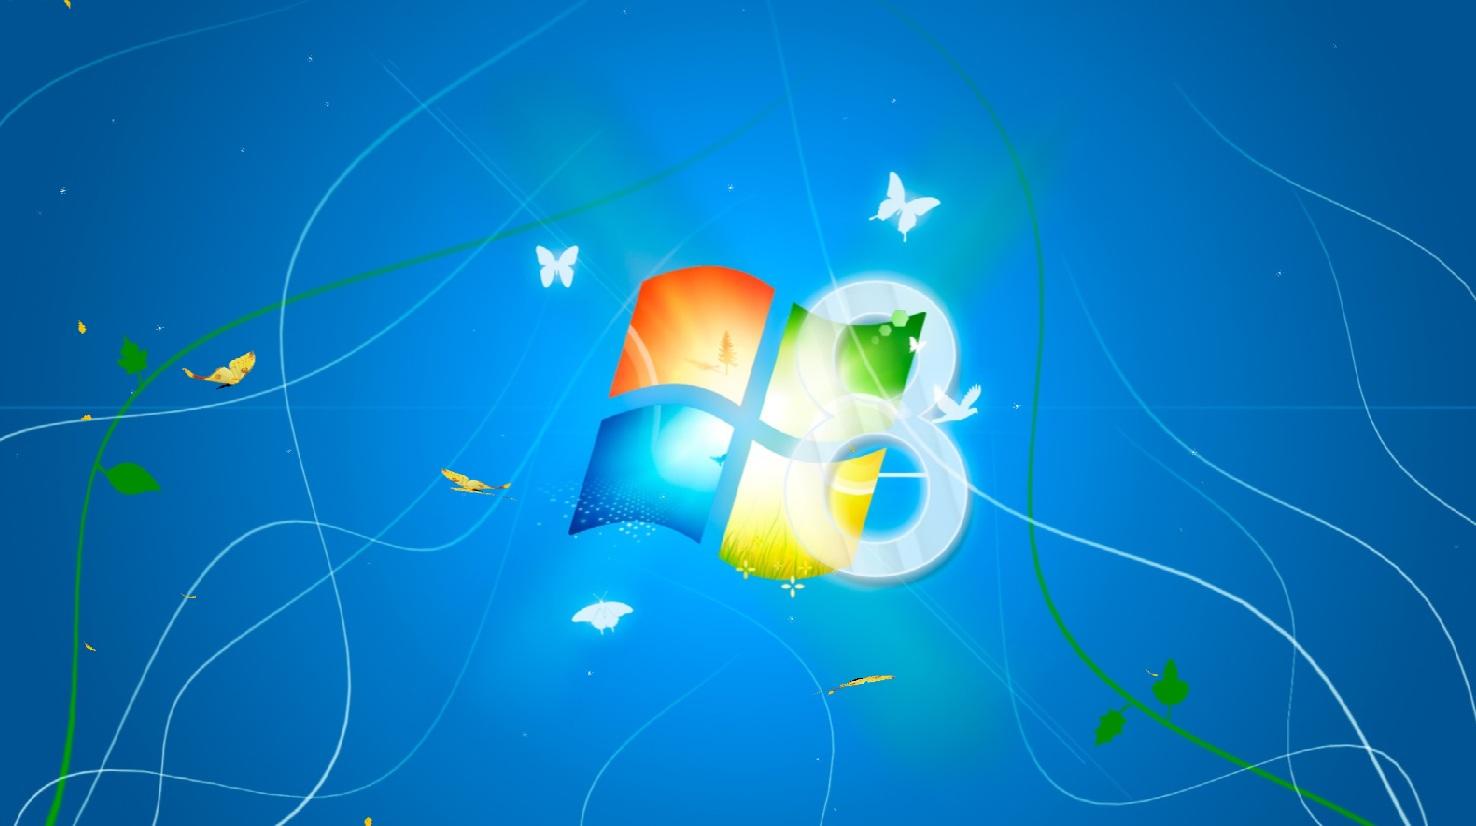 Windows 8 Light Animated Screensaver